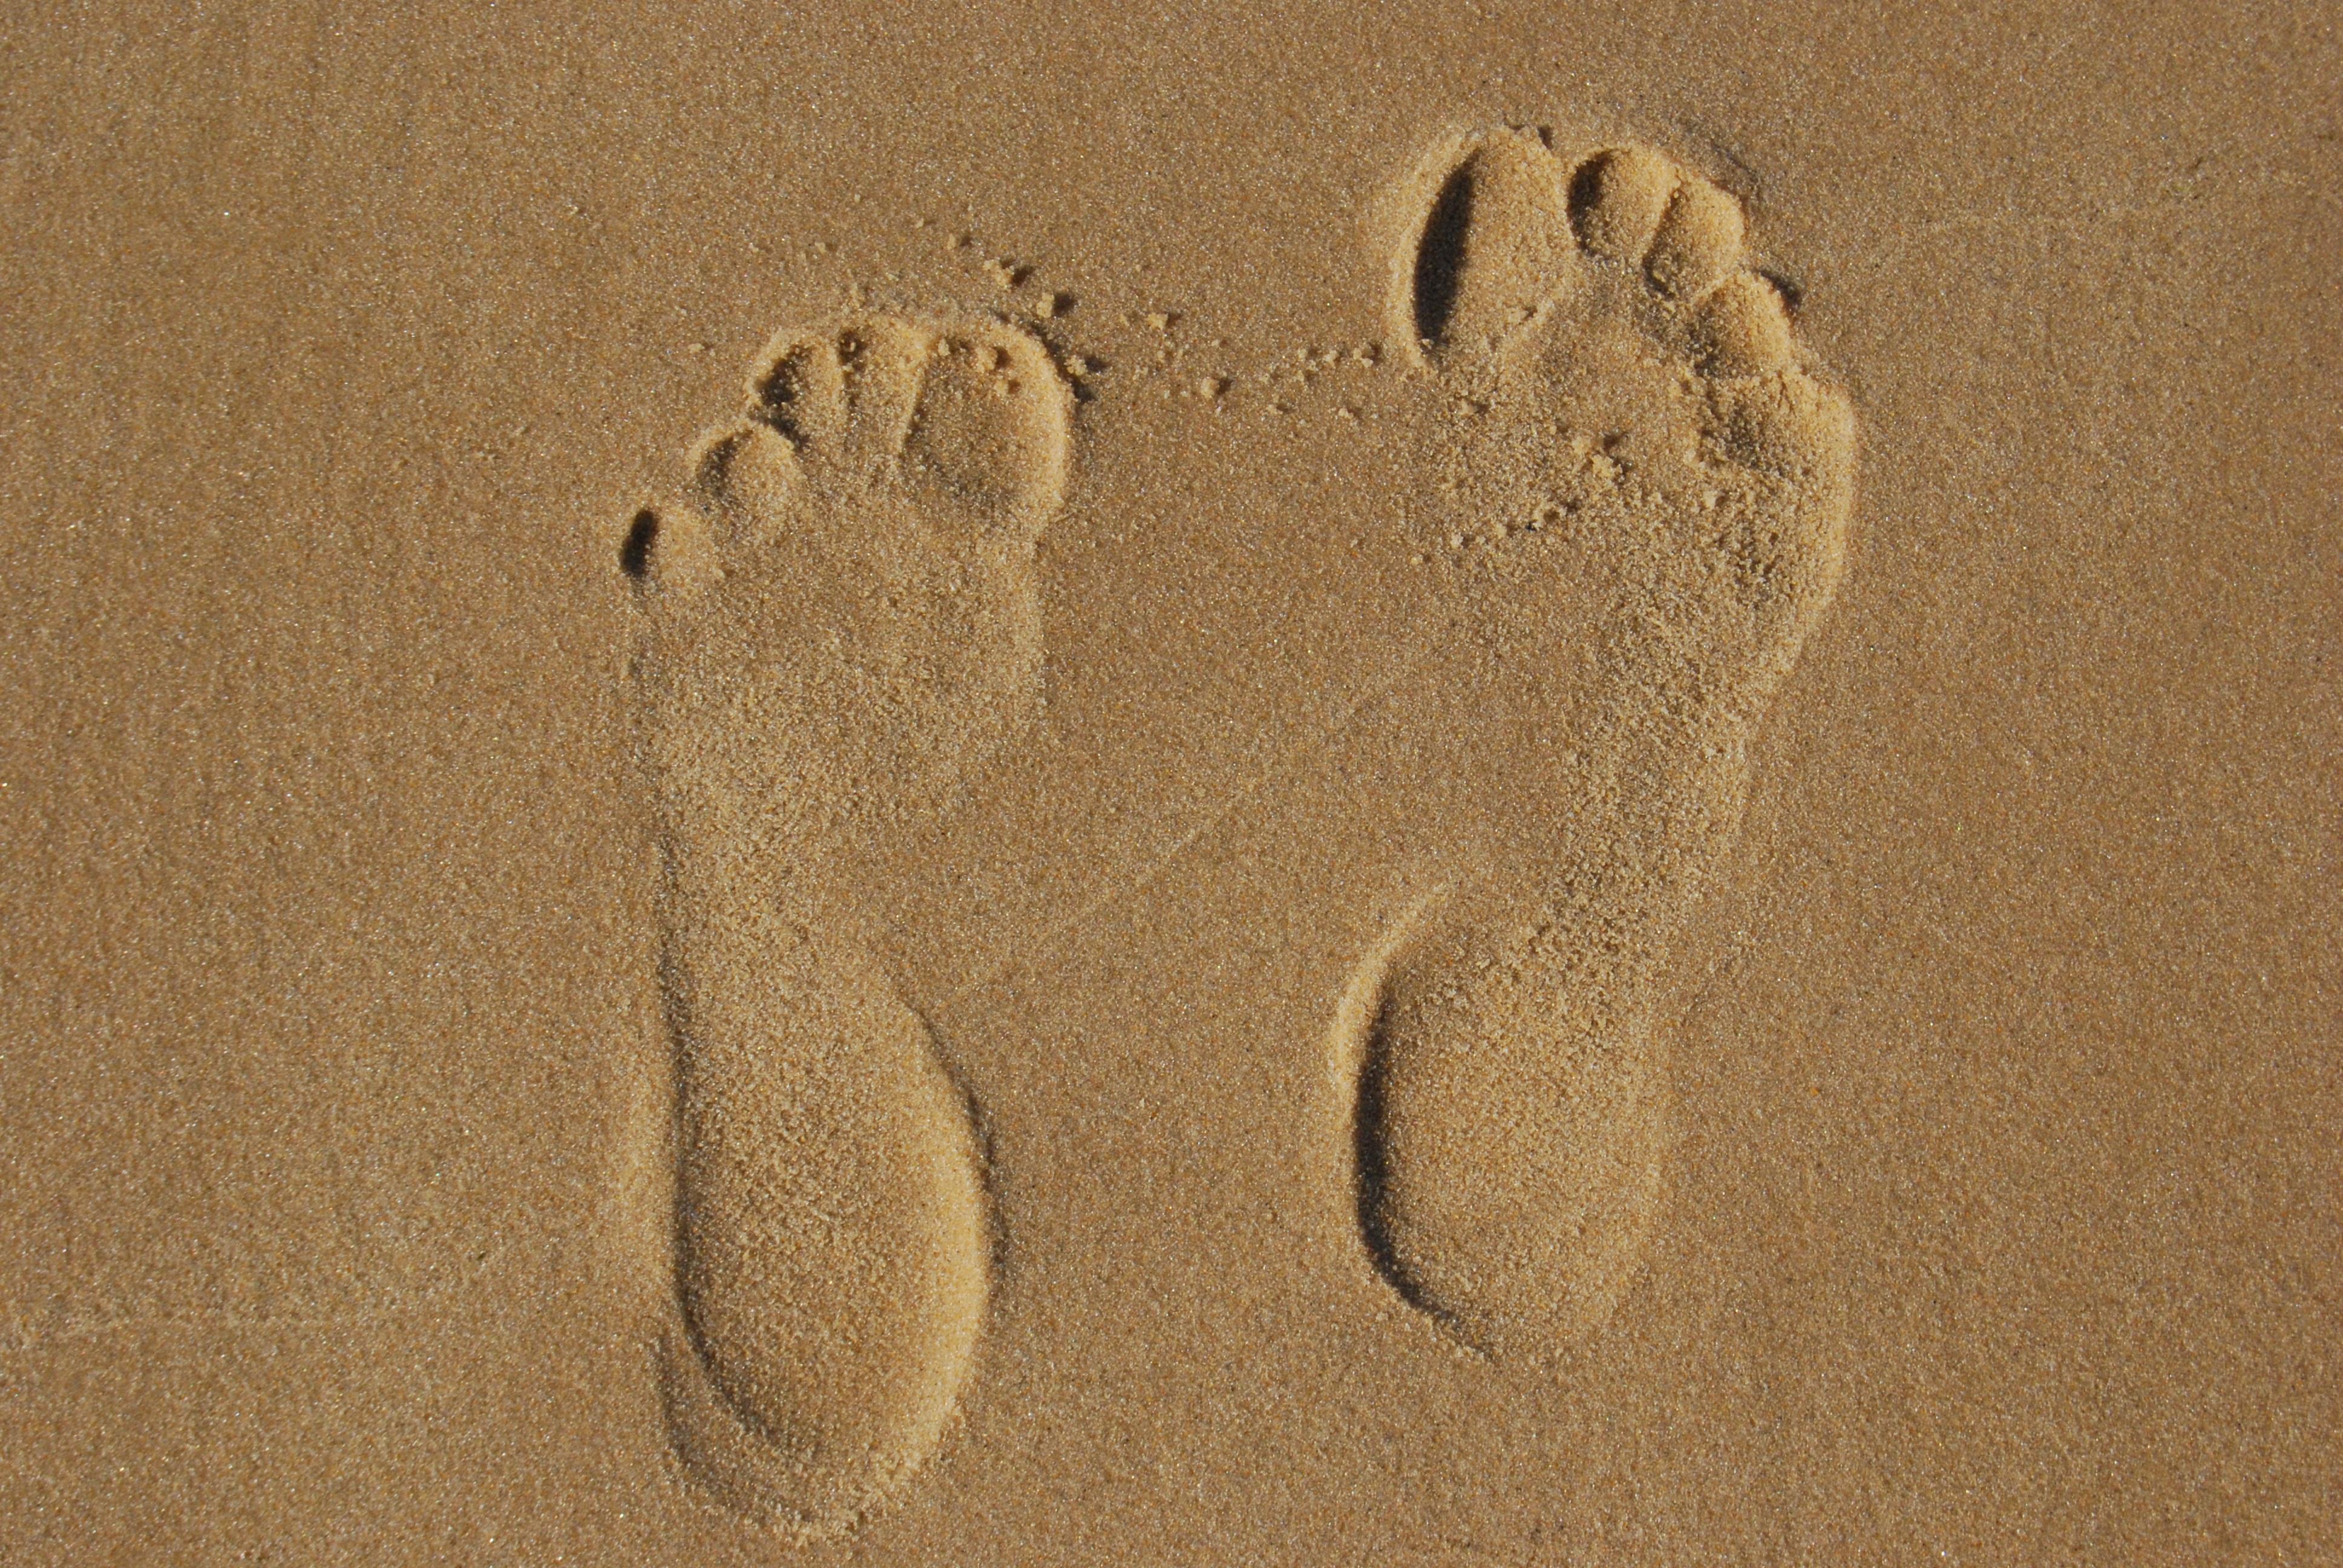 Картинки из следов на песке